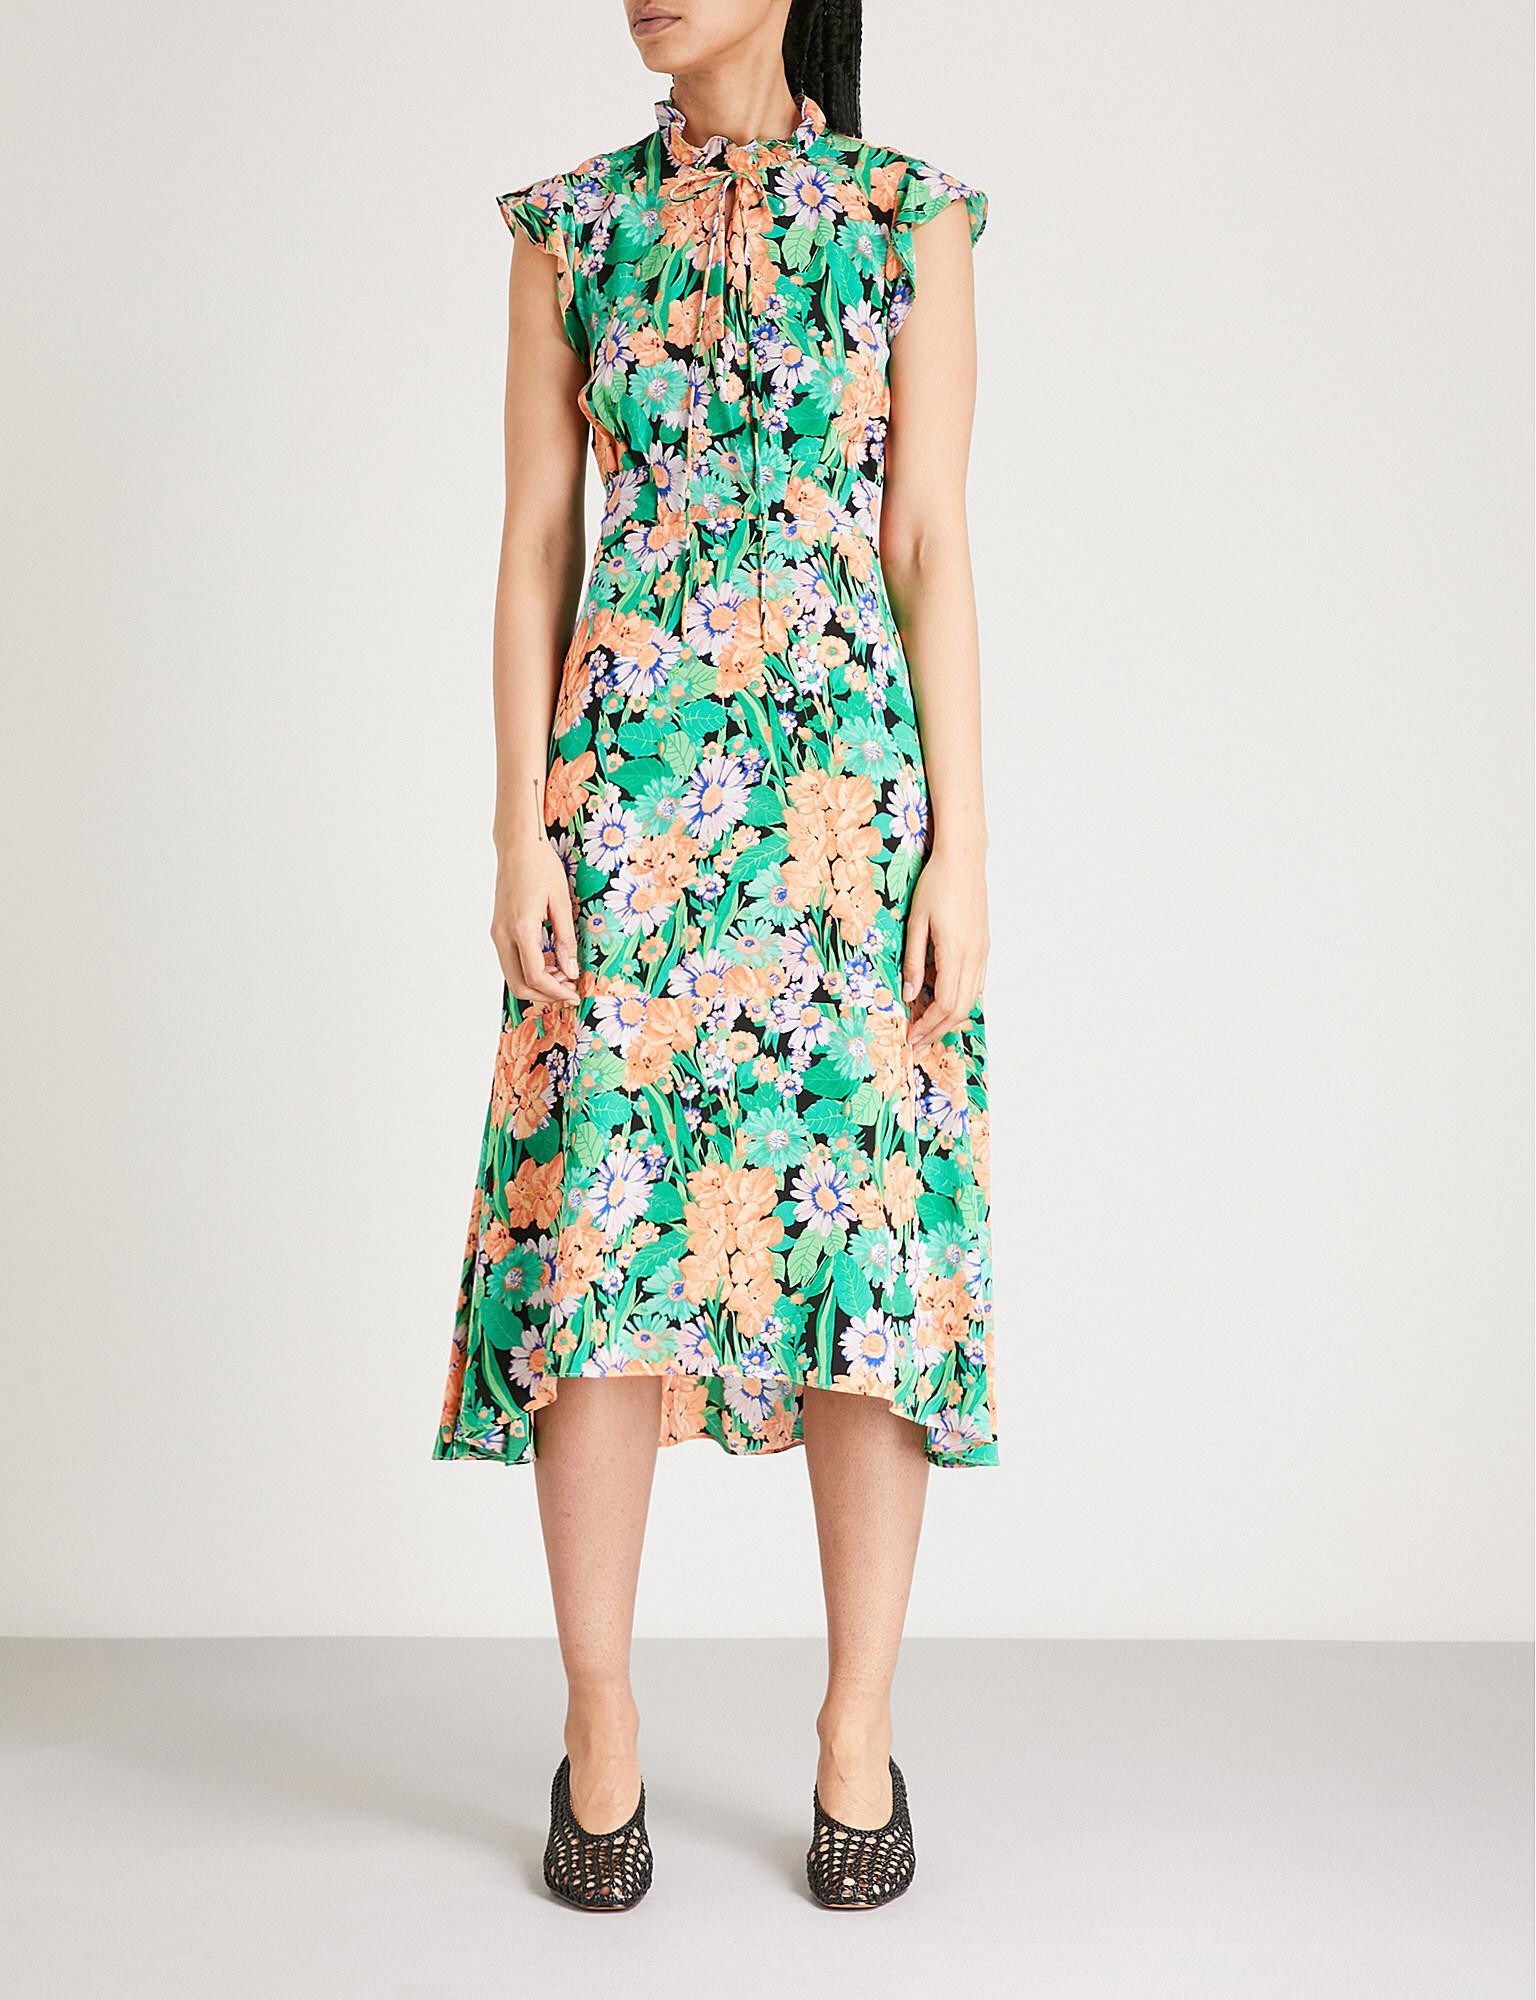 208721df3d1 Sandro Floral-print Silk-crepe Dress in Green - Lyst